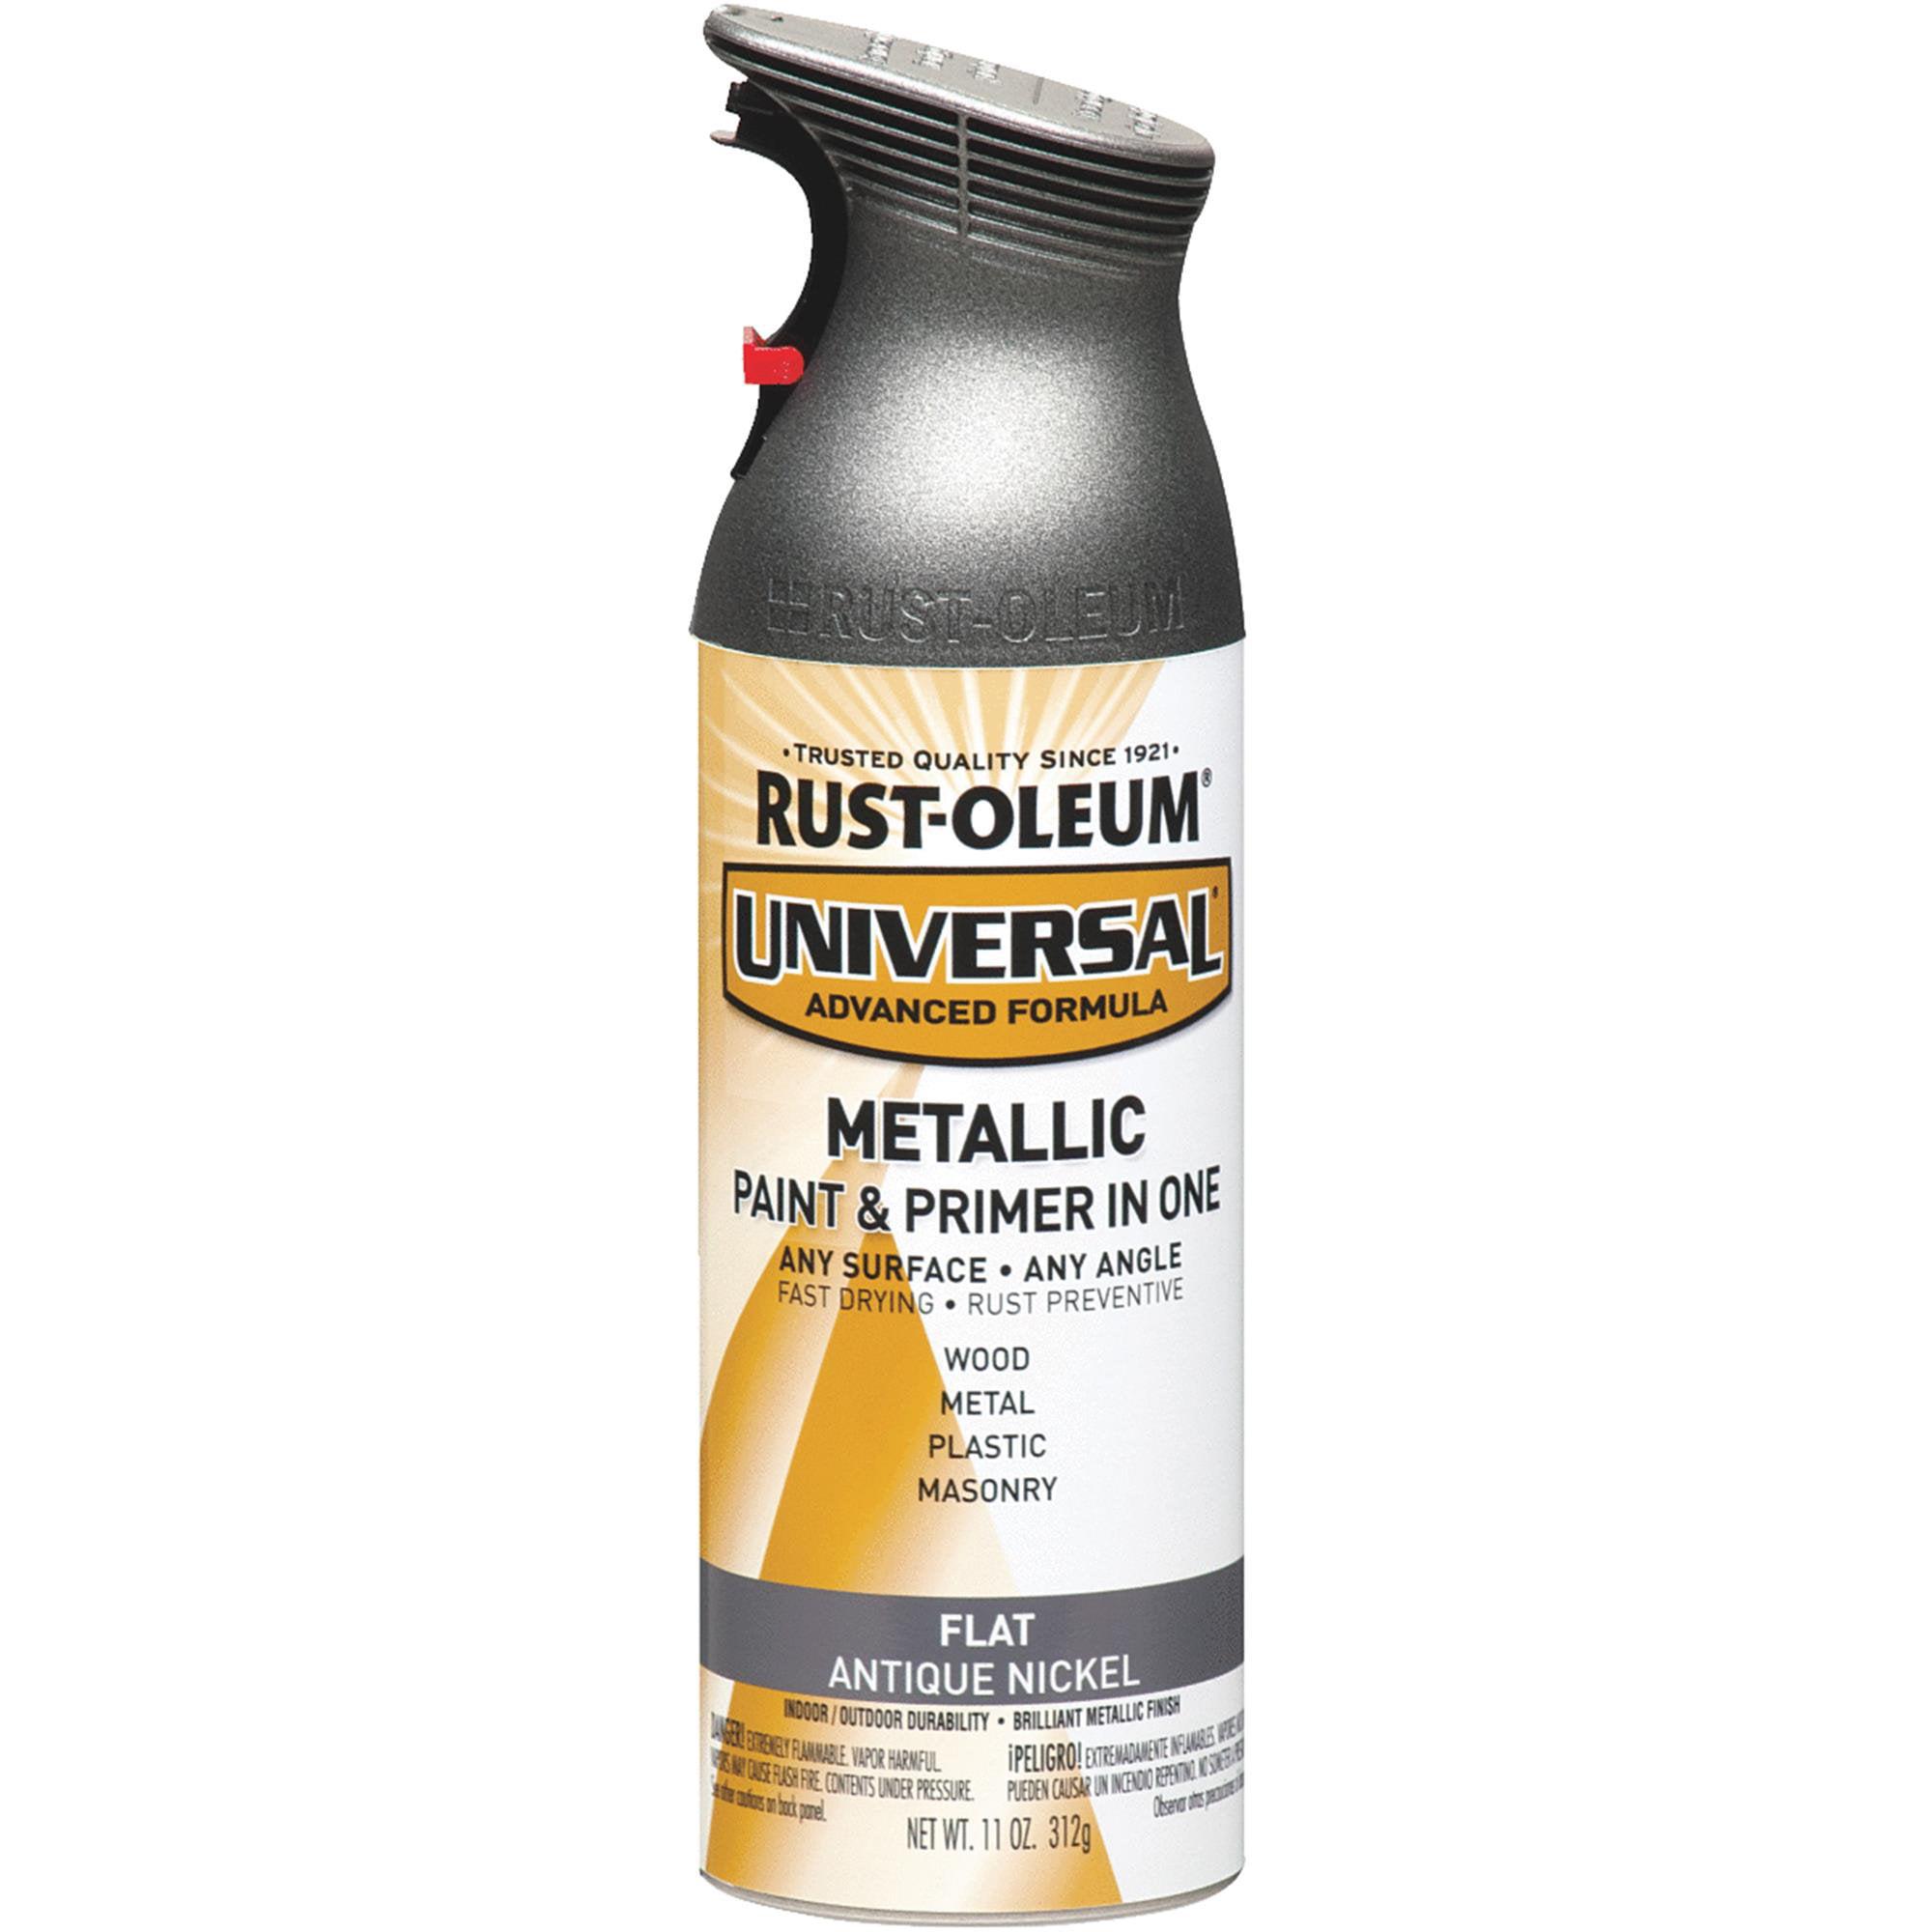 Rust-Oleum Universal All-Surface Metallic Spray Paint